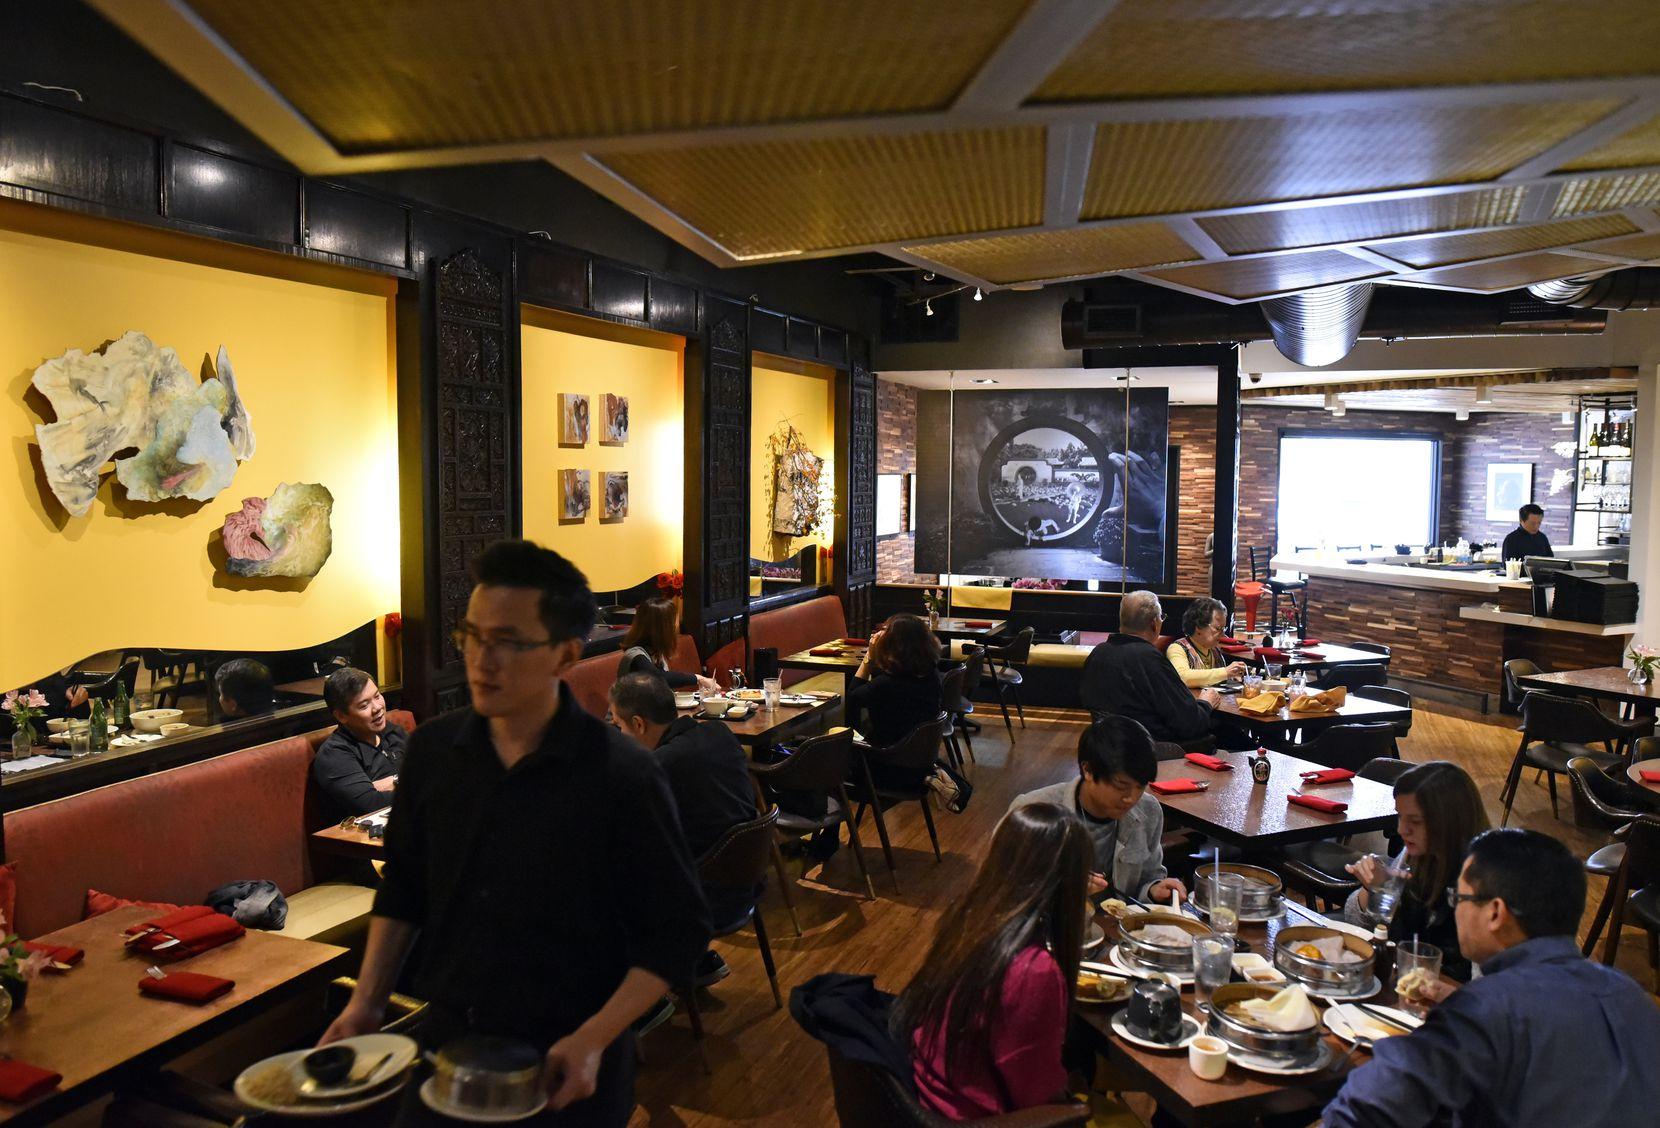 Royal China restaurant in Dallas, Sunday, Dec. 17, 2017. Ben Torres/Special Contributor